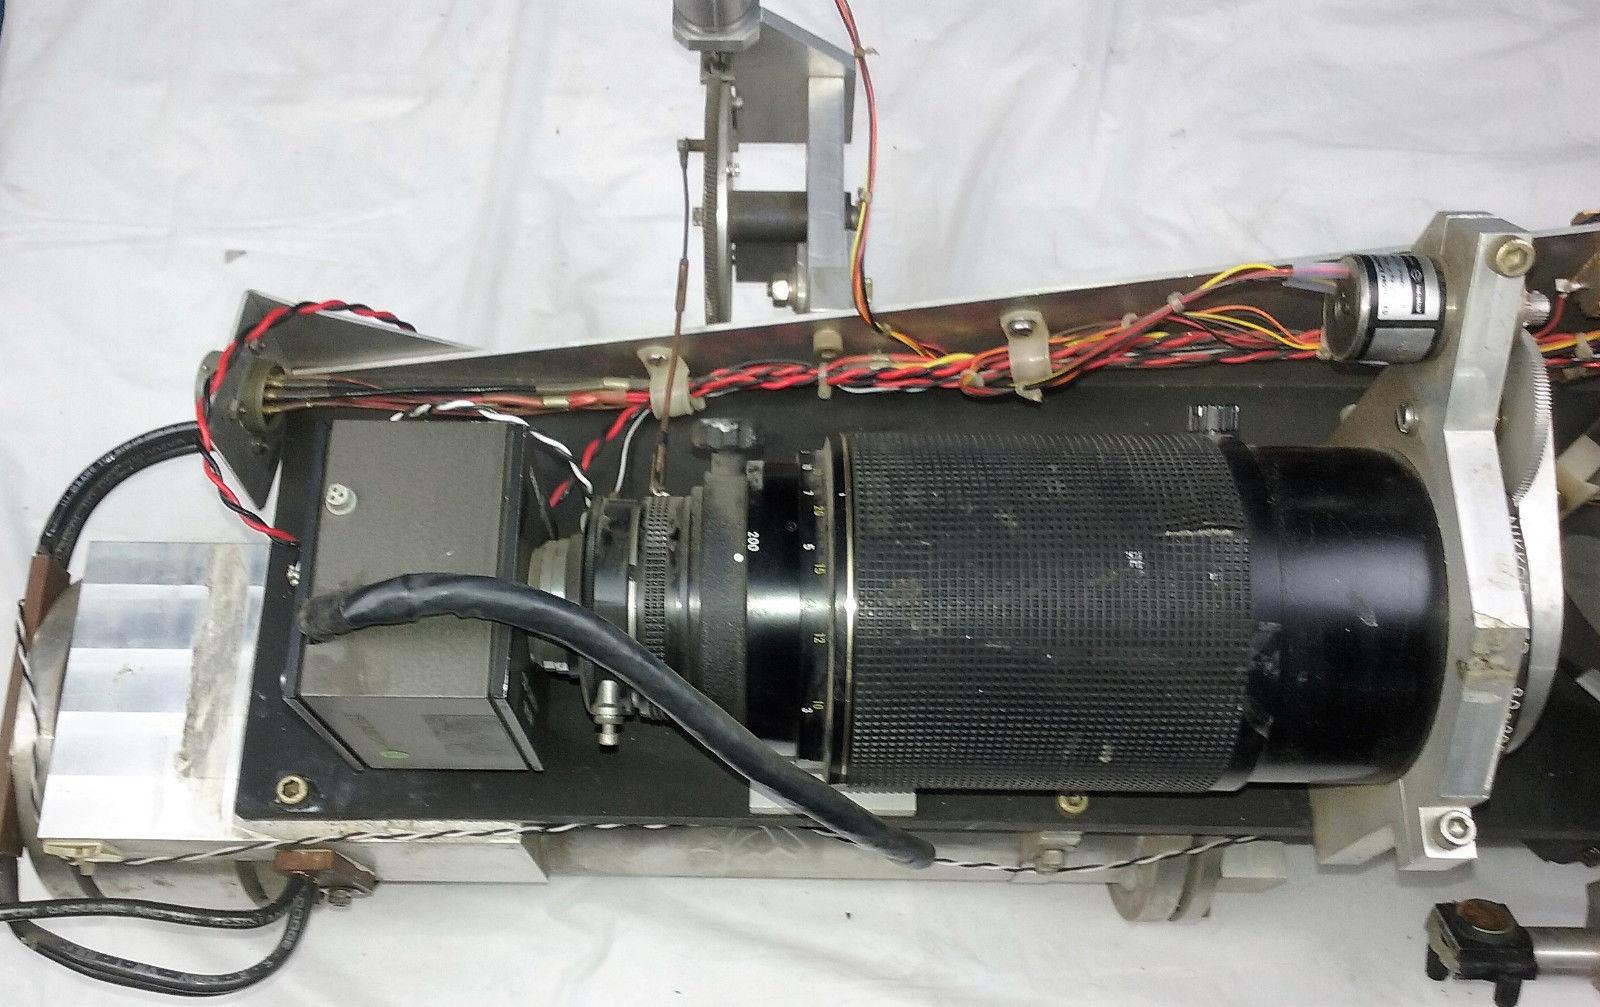 Newport Optical Mount 600A-4 Nikkor 80-200mm Lab Equipment Laser Photonics Lens